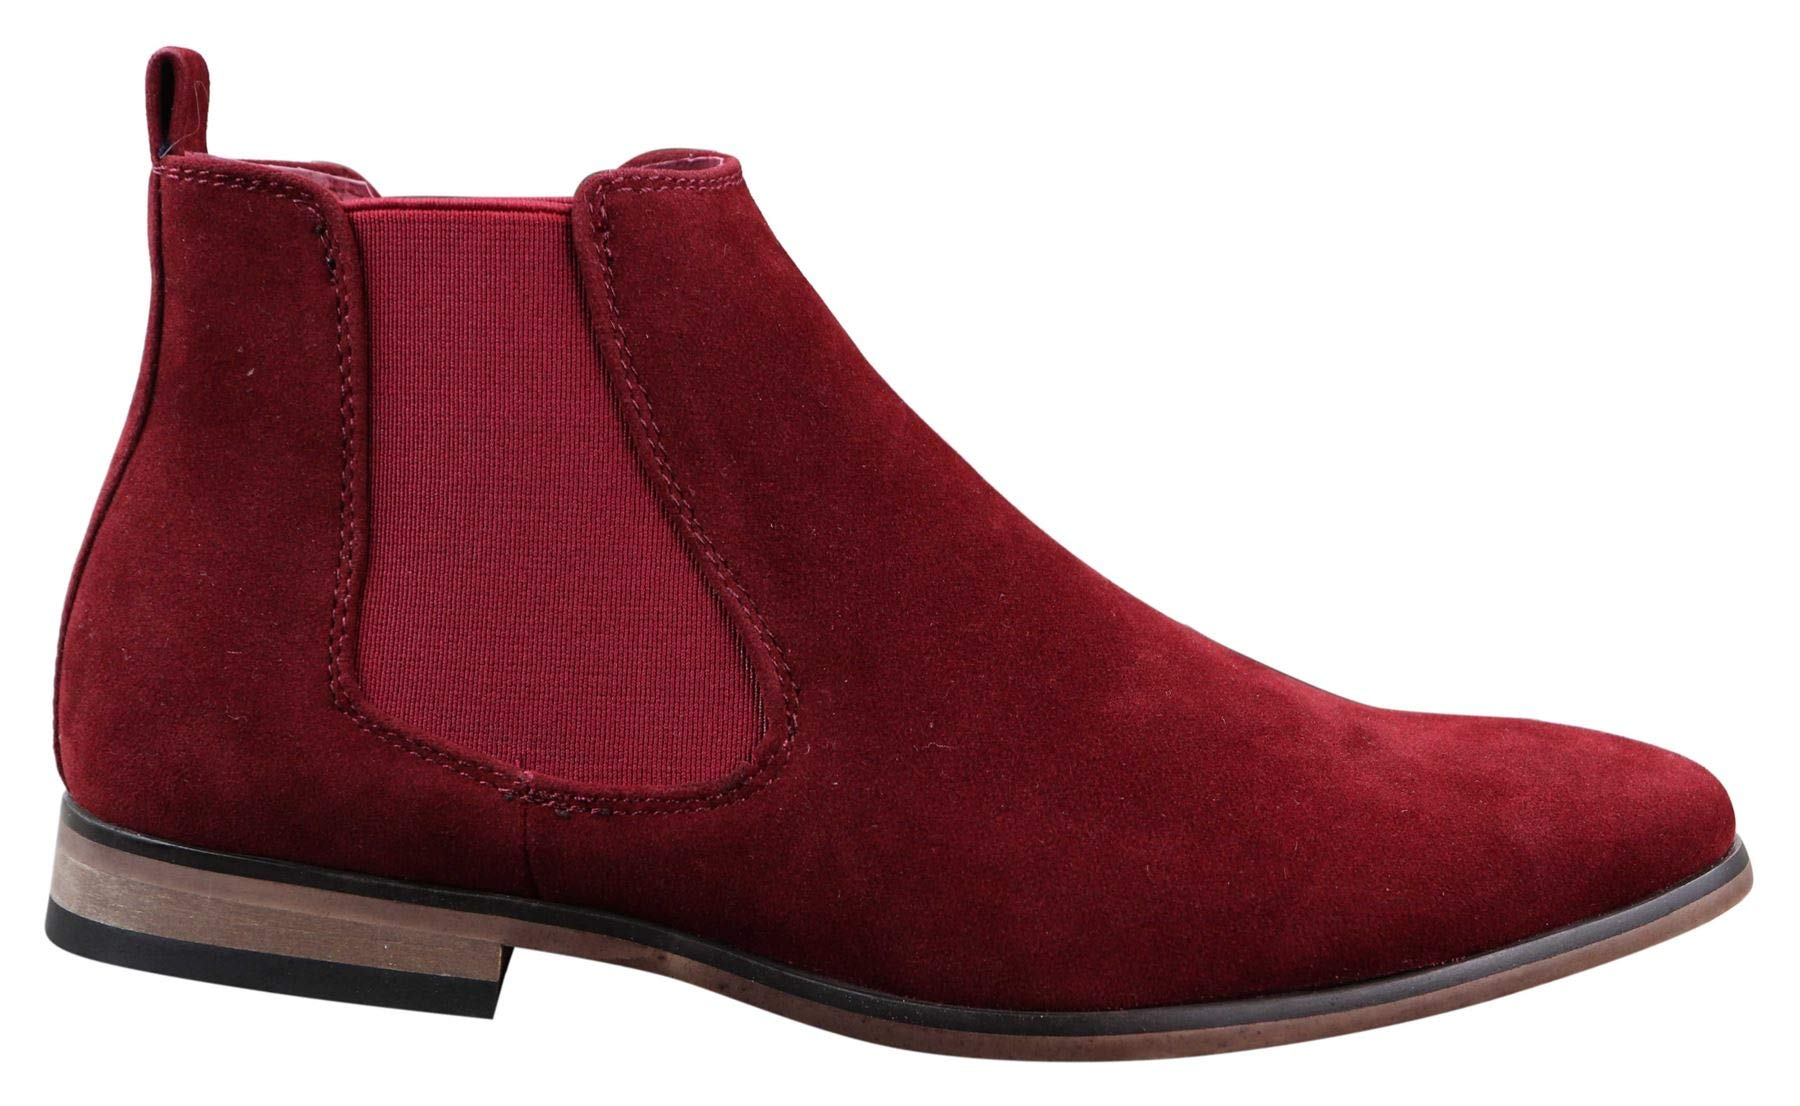 Mens Brown Italian Suede Chelsea Ankle Boots Smart Casual Desert Dealer Slip On